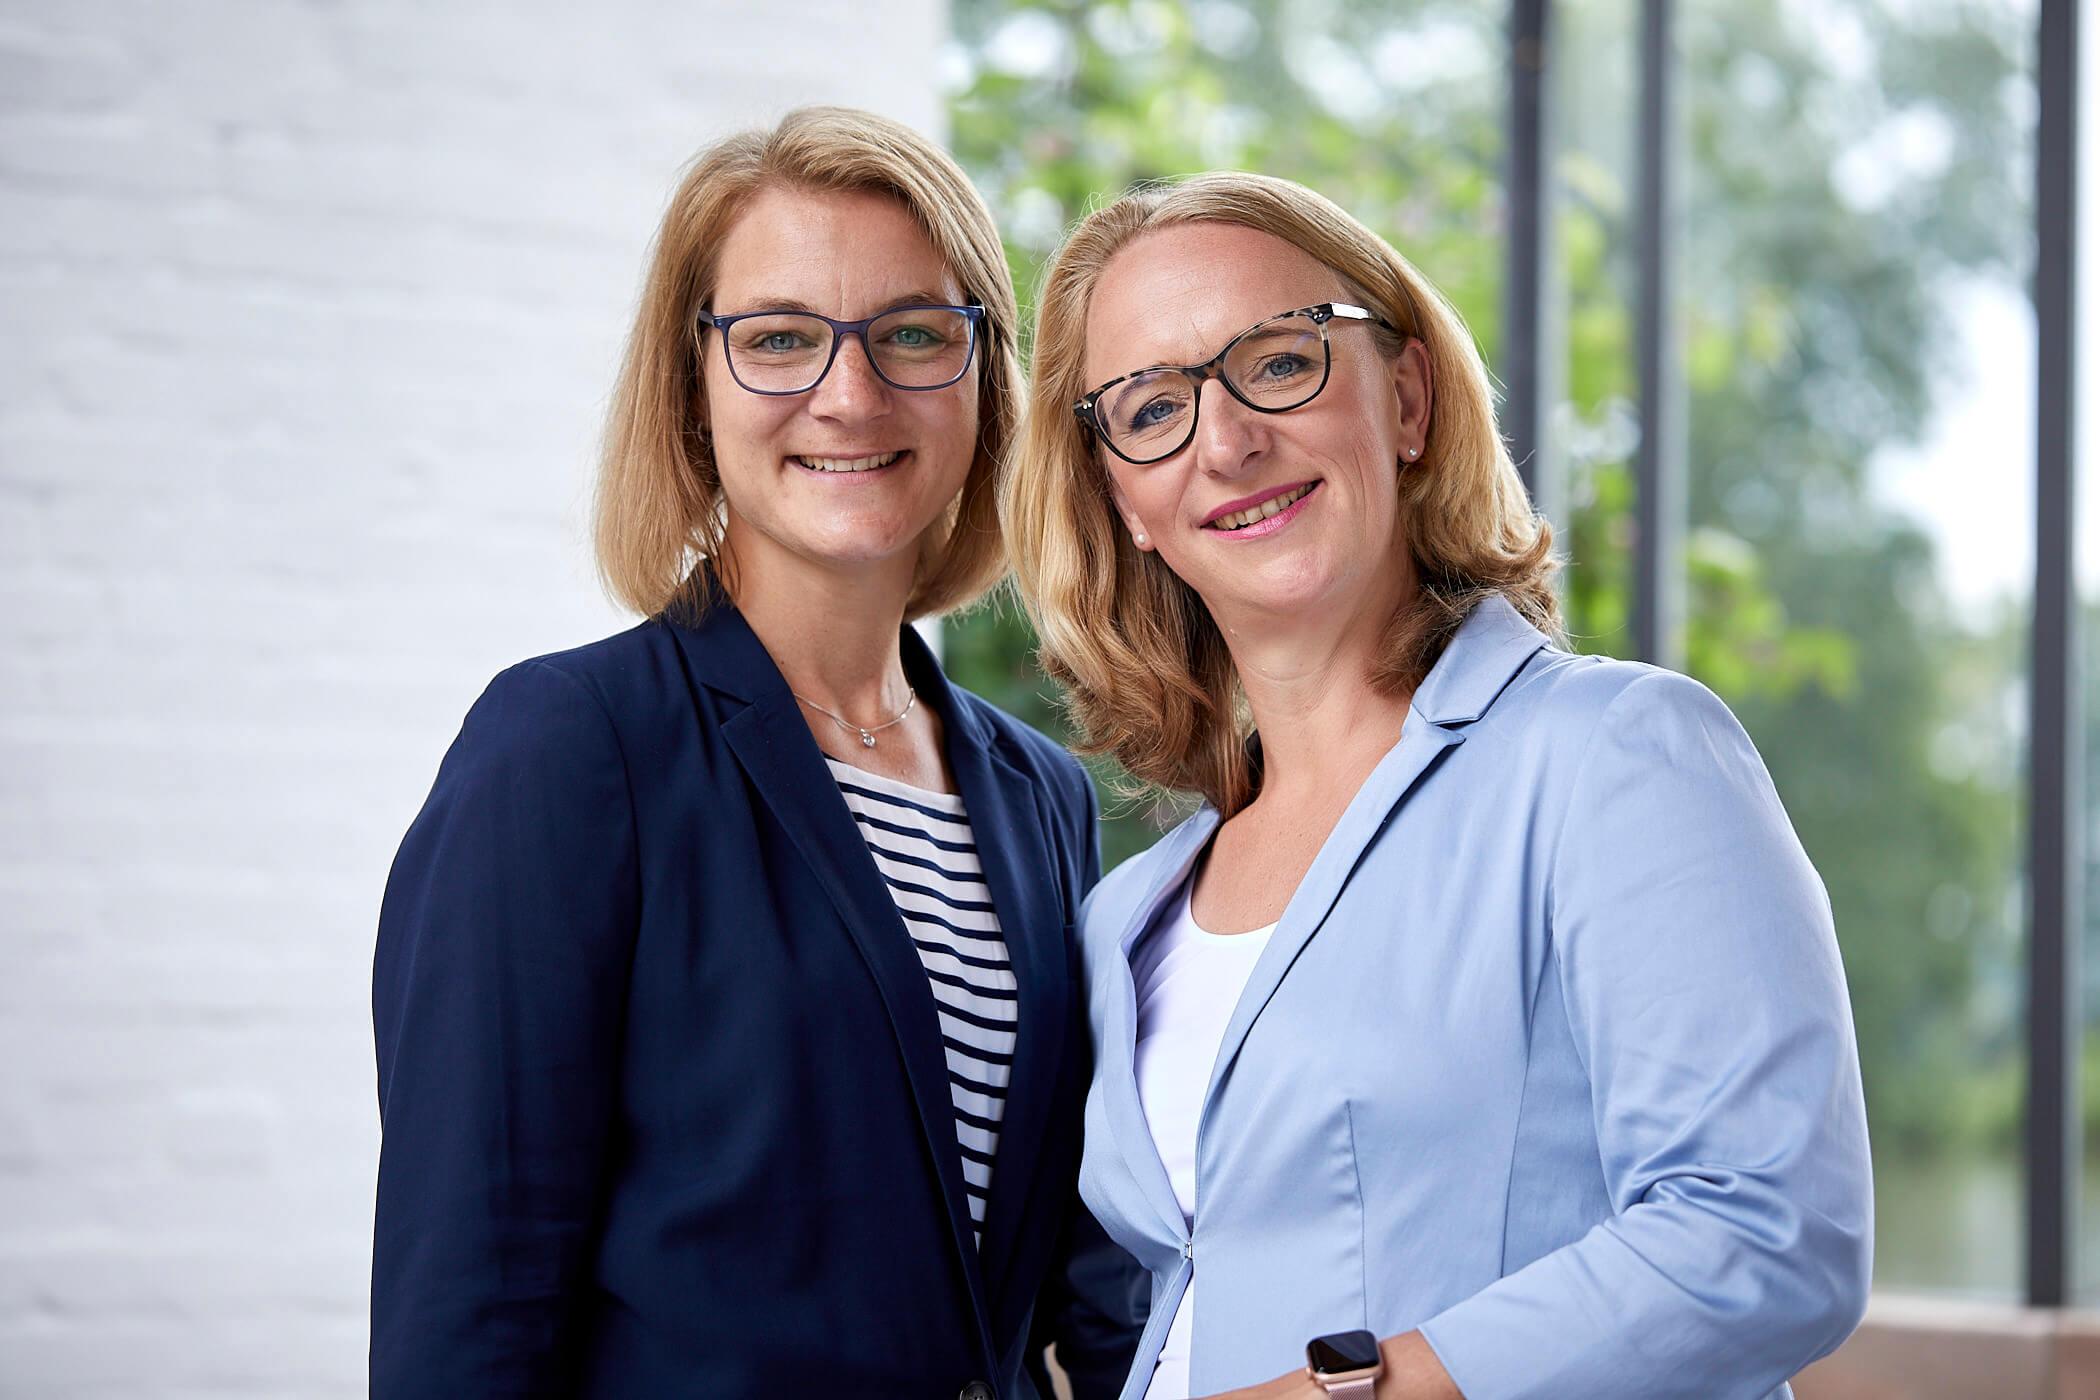 Führungskräfte-coaching, Coaching für Führungskräfte, Kathrin Nökel, Leadership WakeUp Call_Anmeldung 1